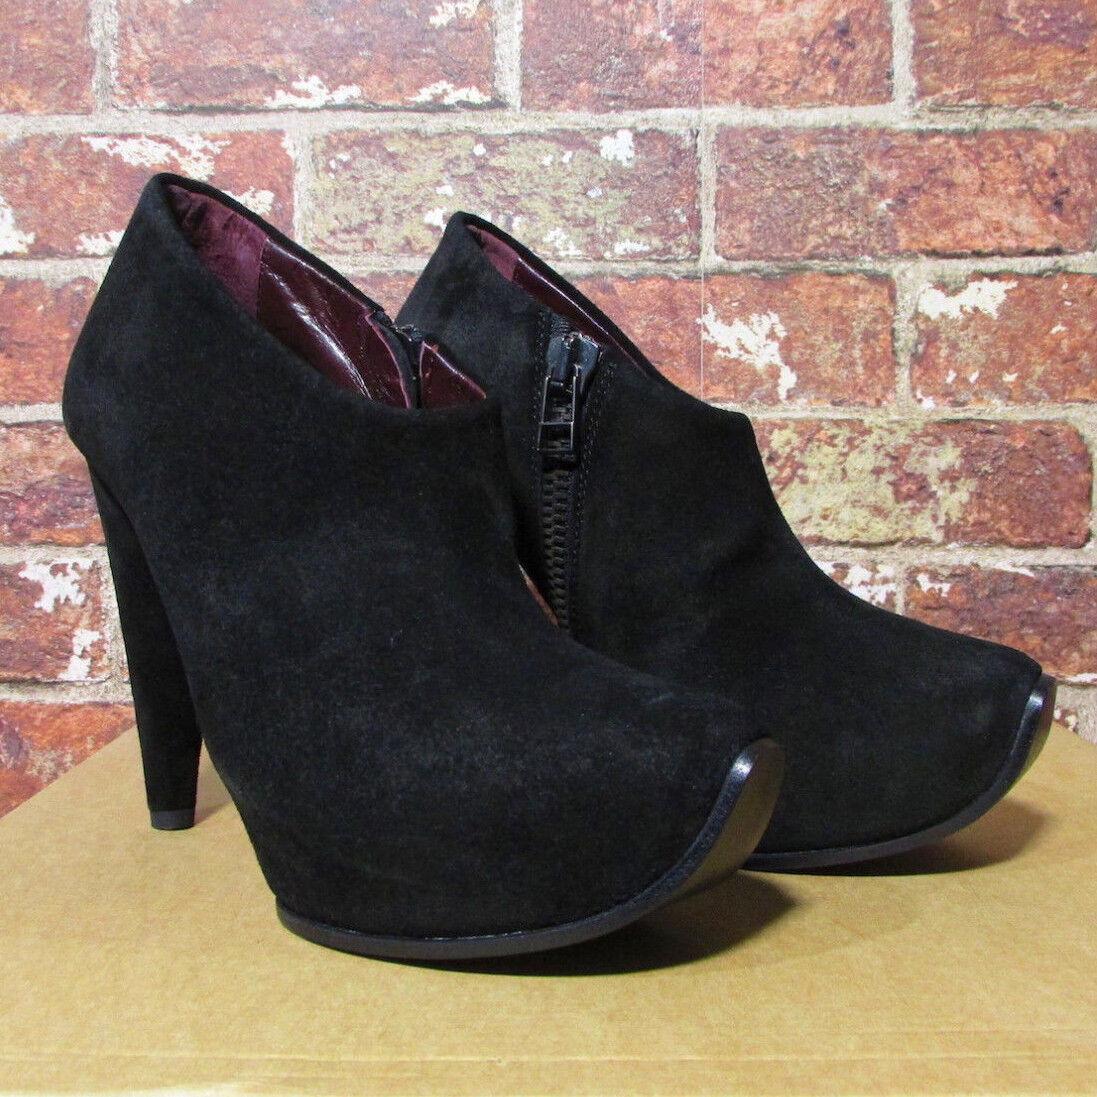 Acne Studios 38 Adon Pumps Heels Black Suede Leather Booties Platform